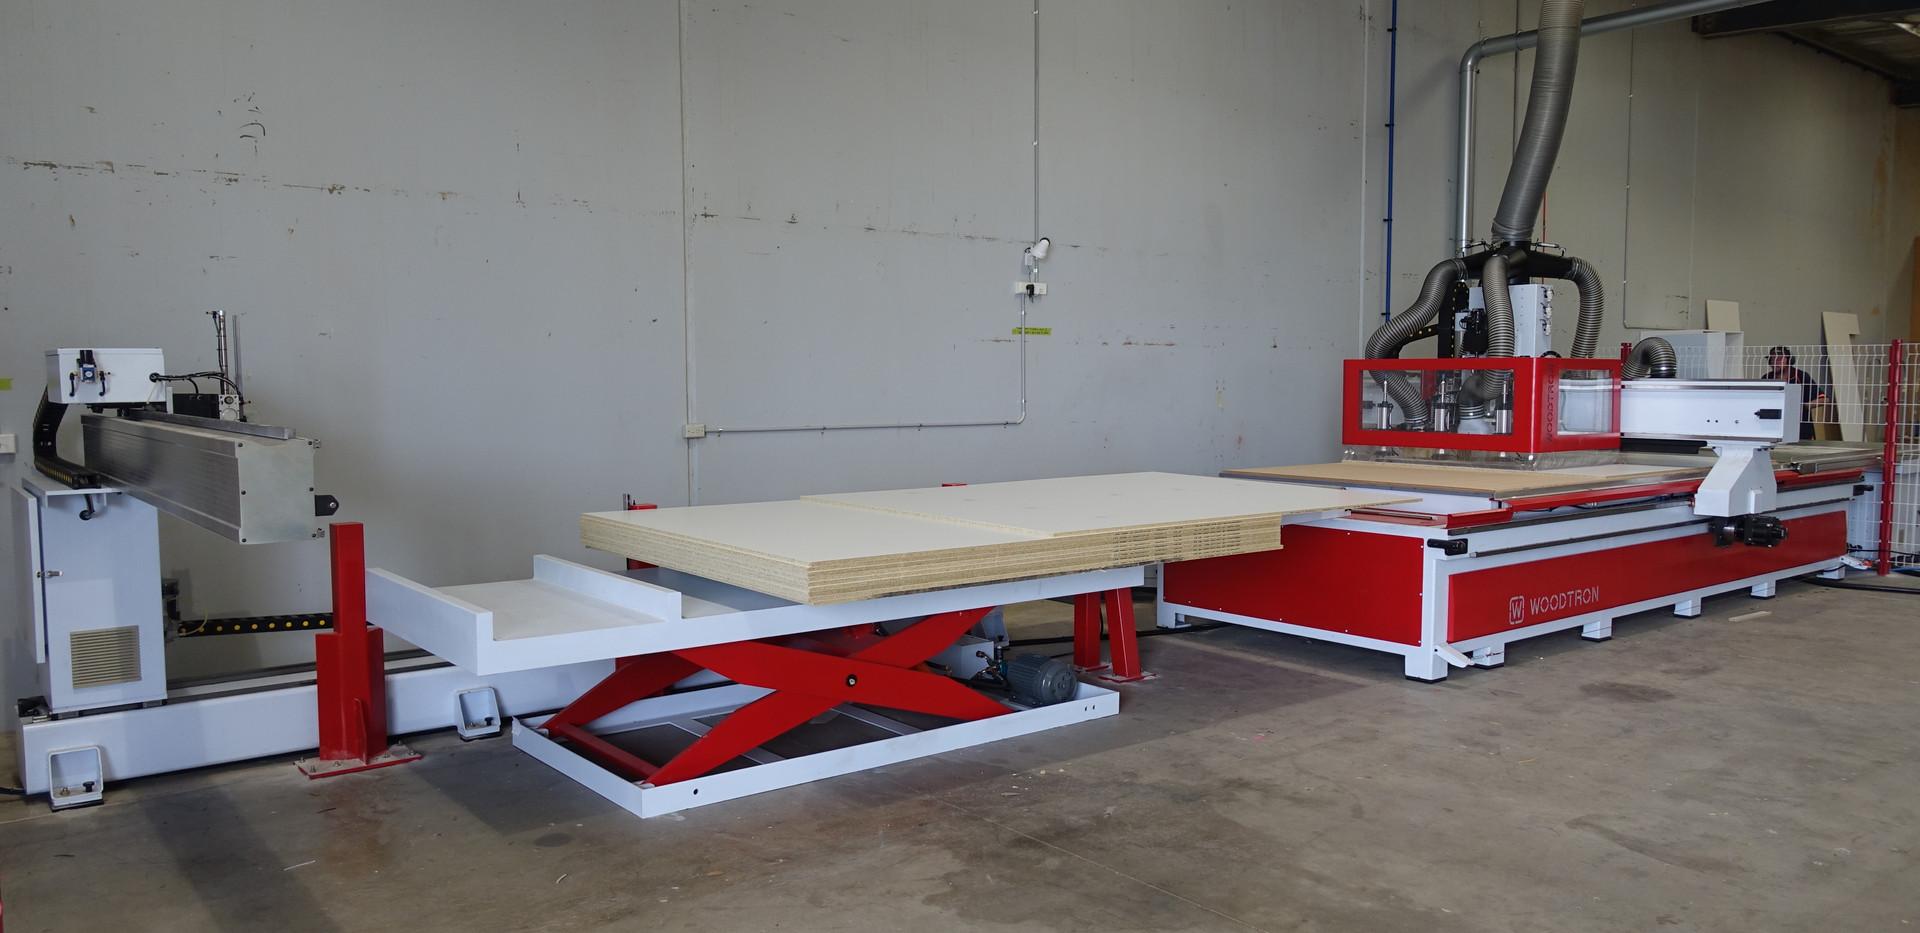 Cabinet Maker in Geelong, VIC